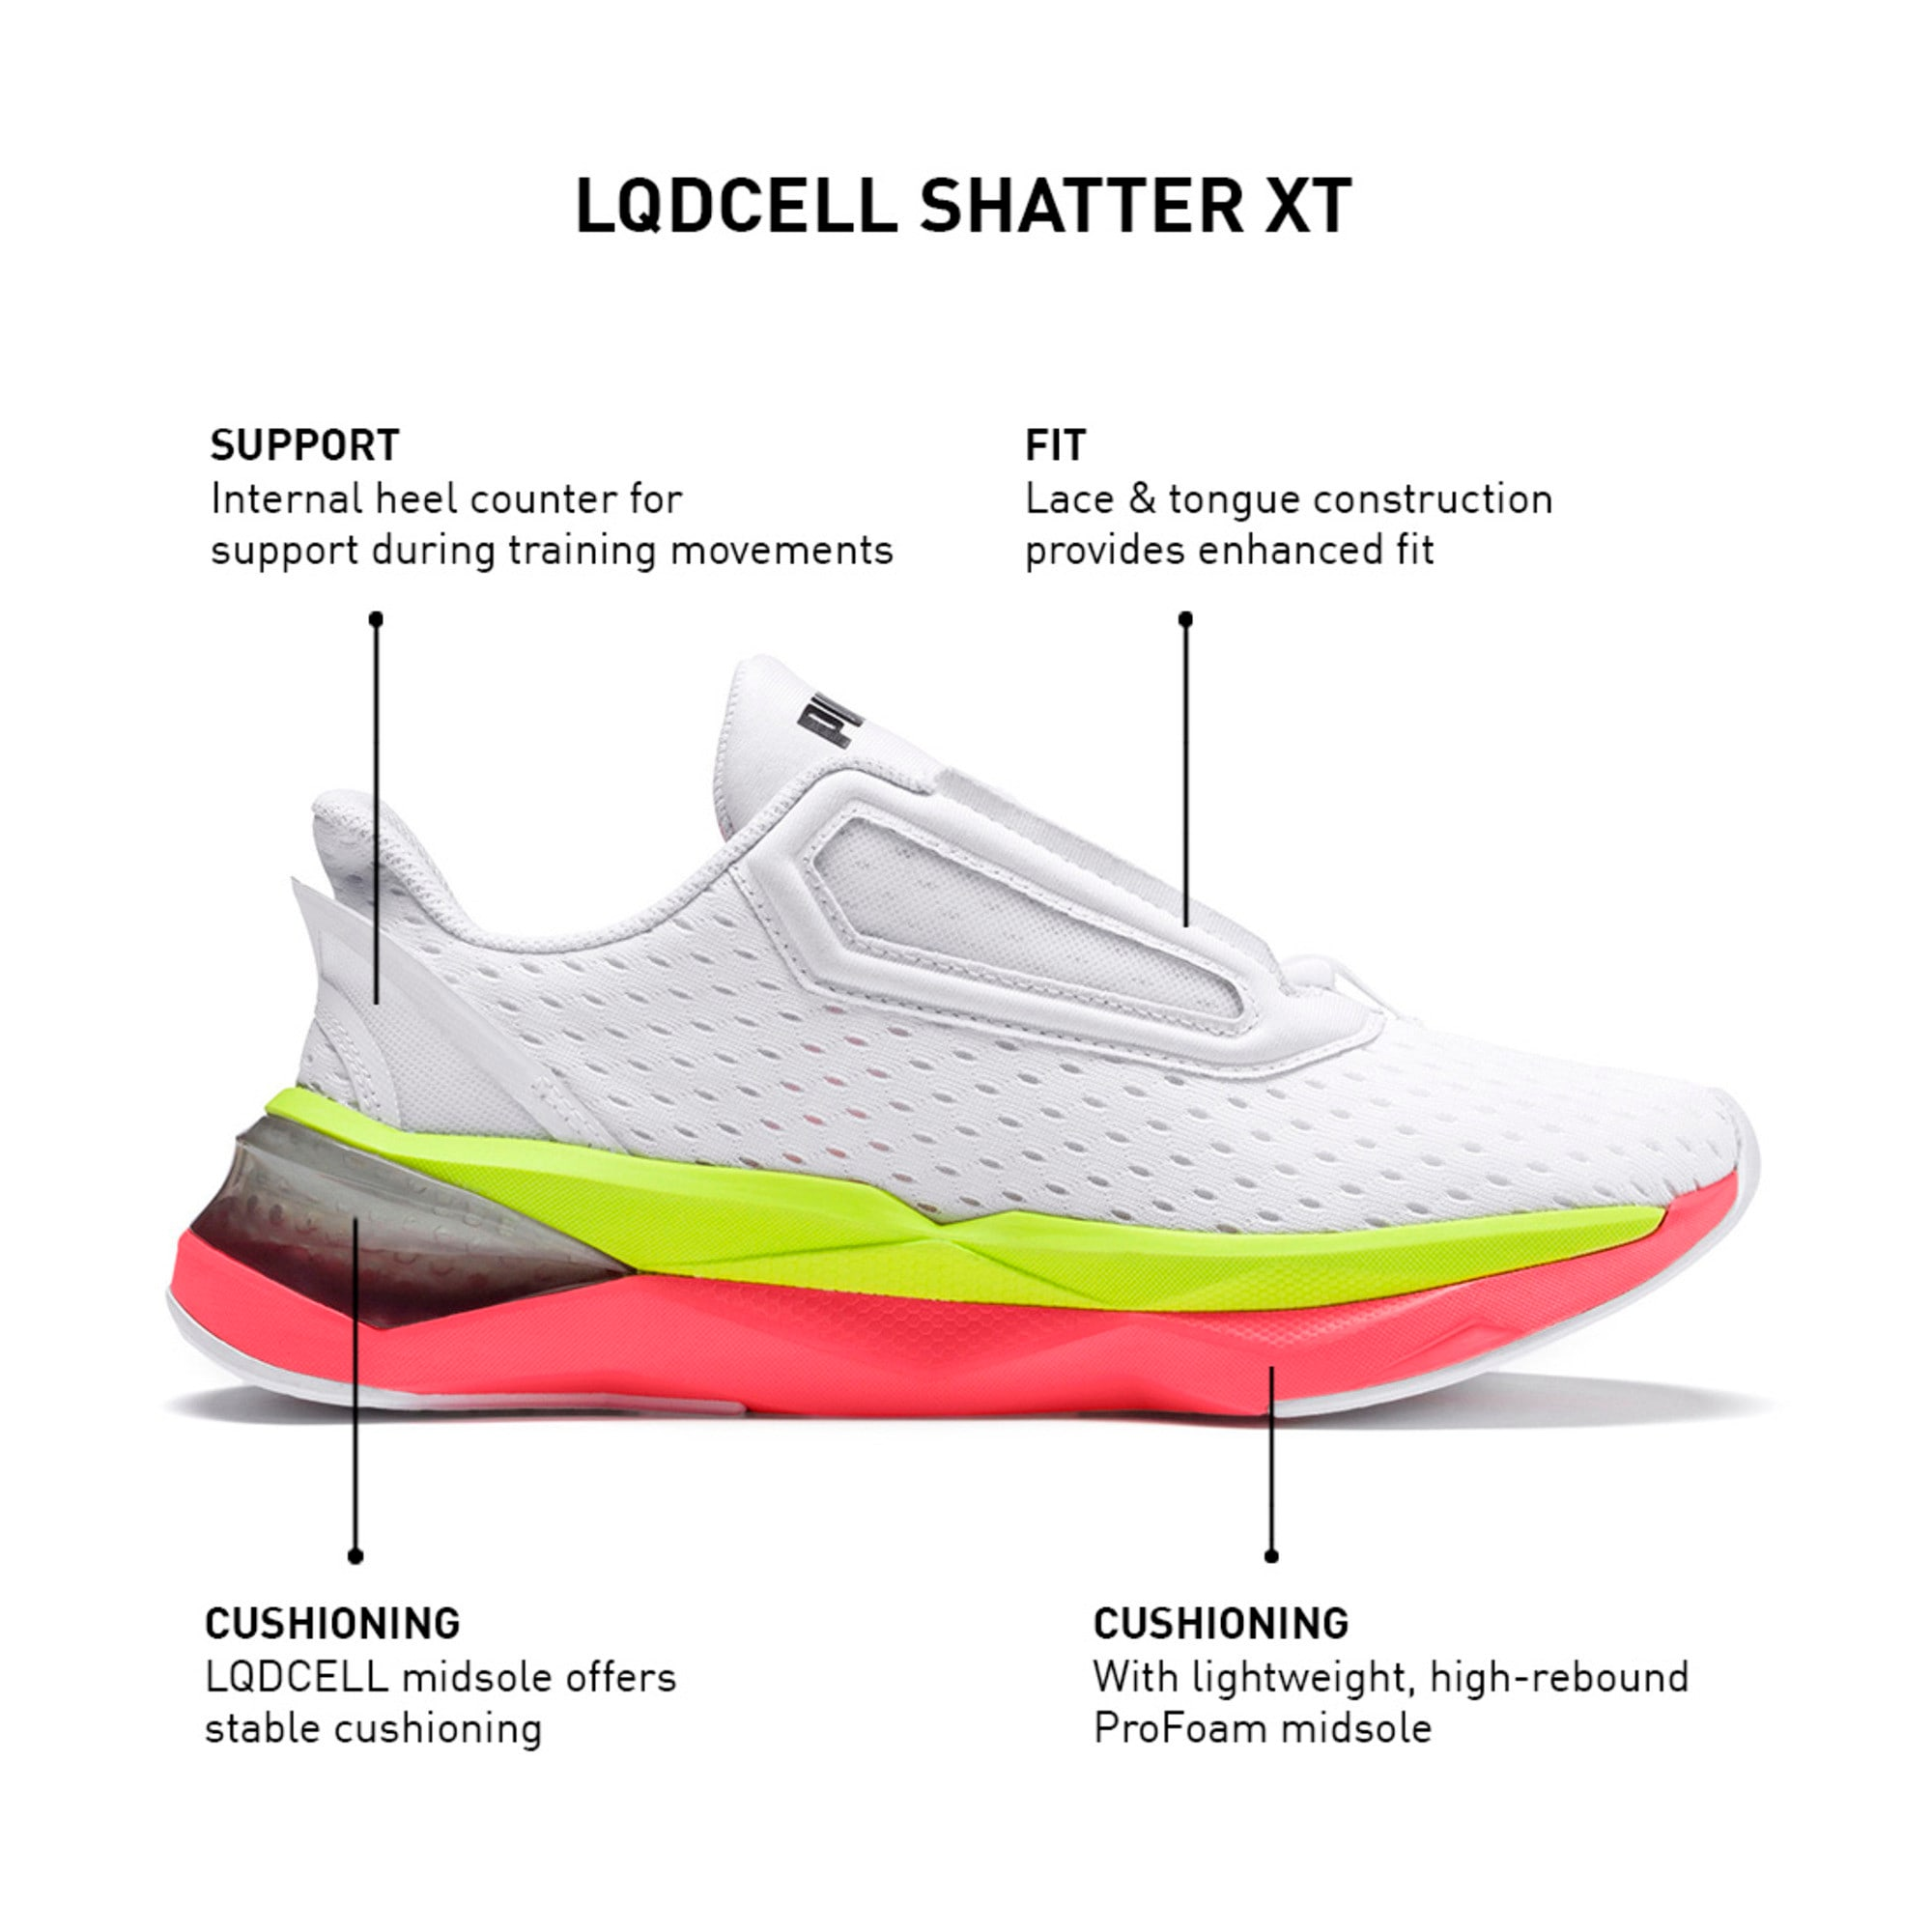 Thumbnail 13 of LQDCell Shatter XT Women's Training Shoes, Puma White-Pink Alert, medium-IND